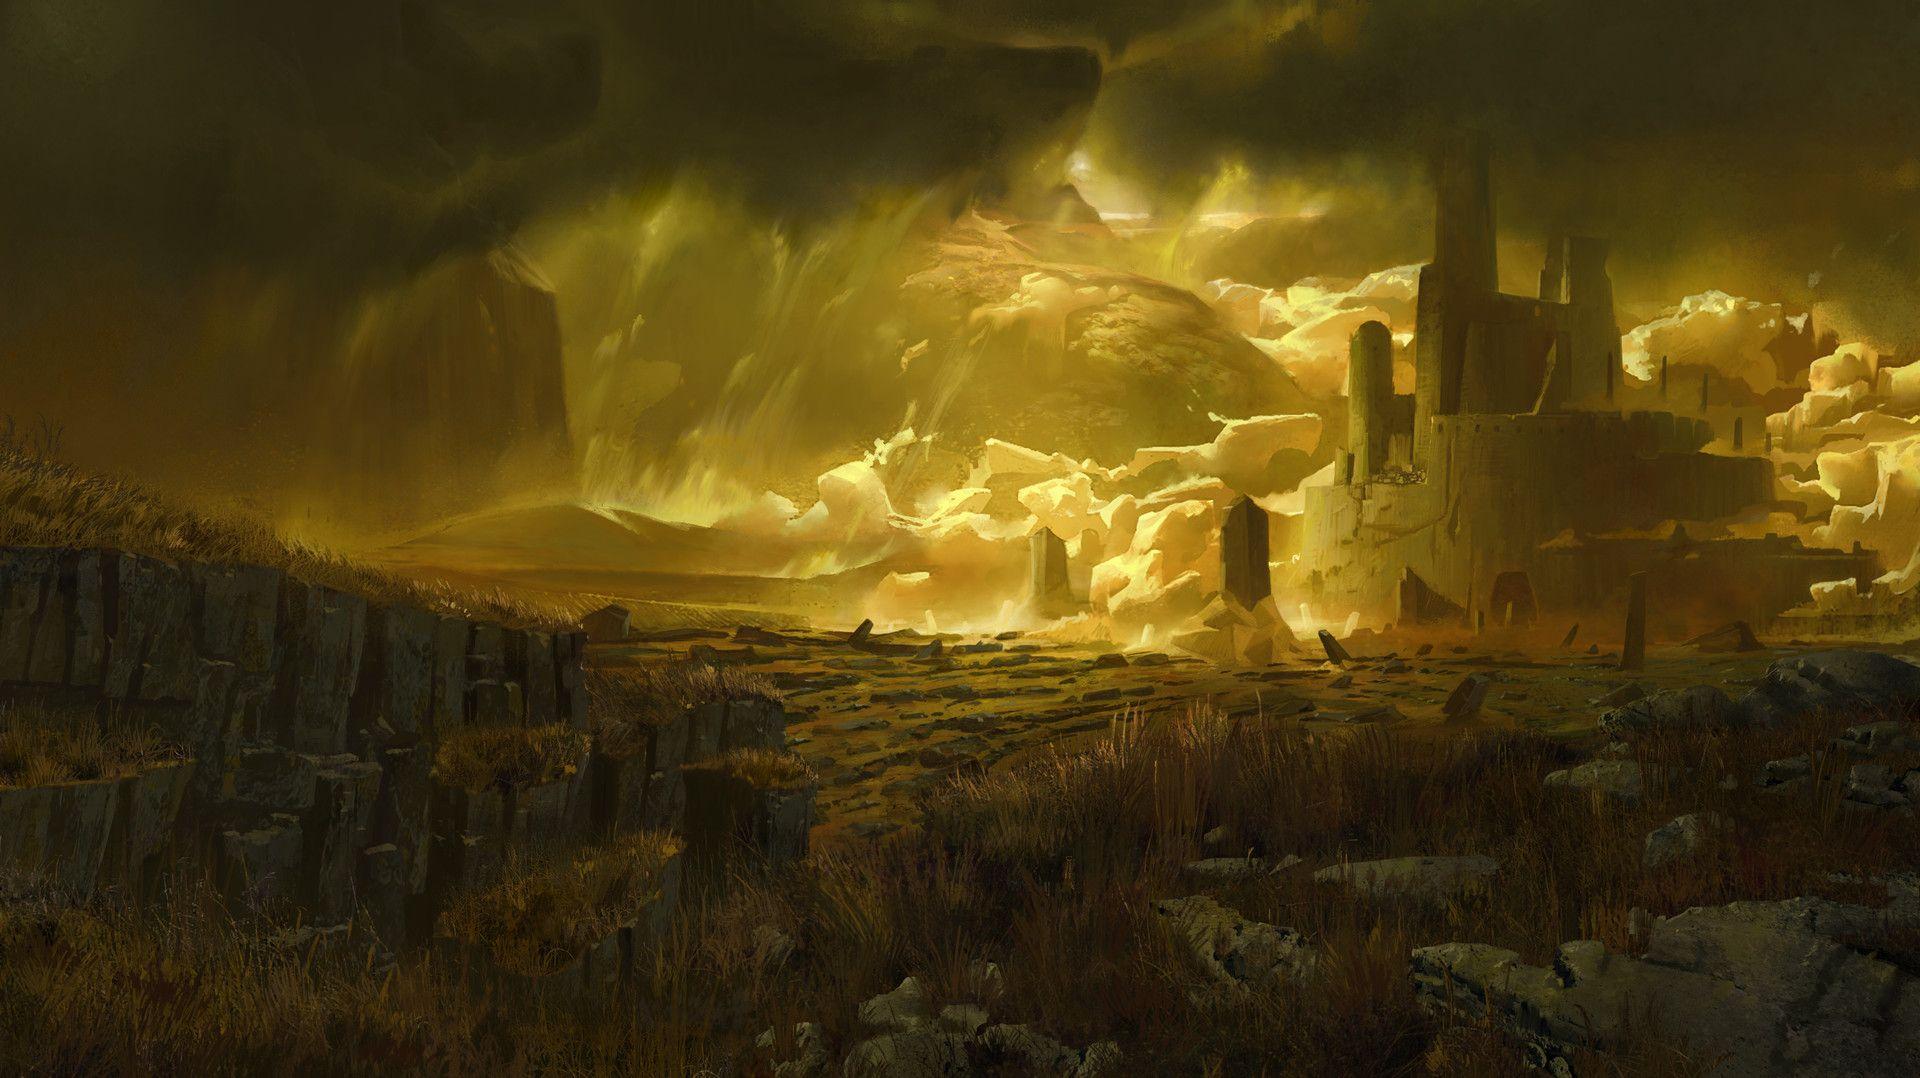 ArtStation - Sulfur Plains, Elijah McNeal